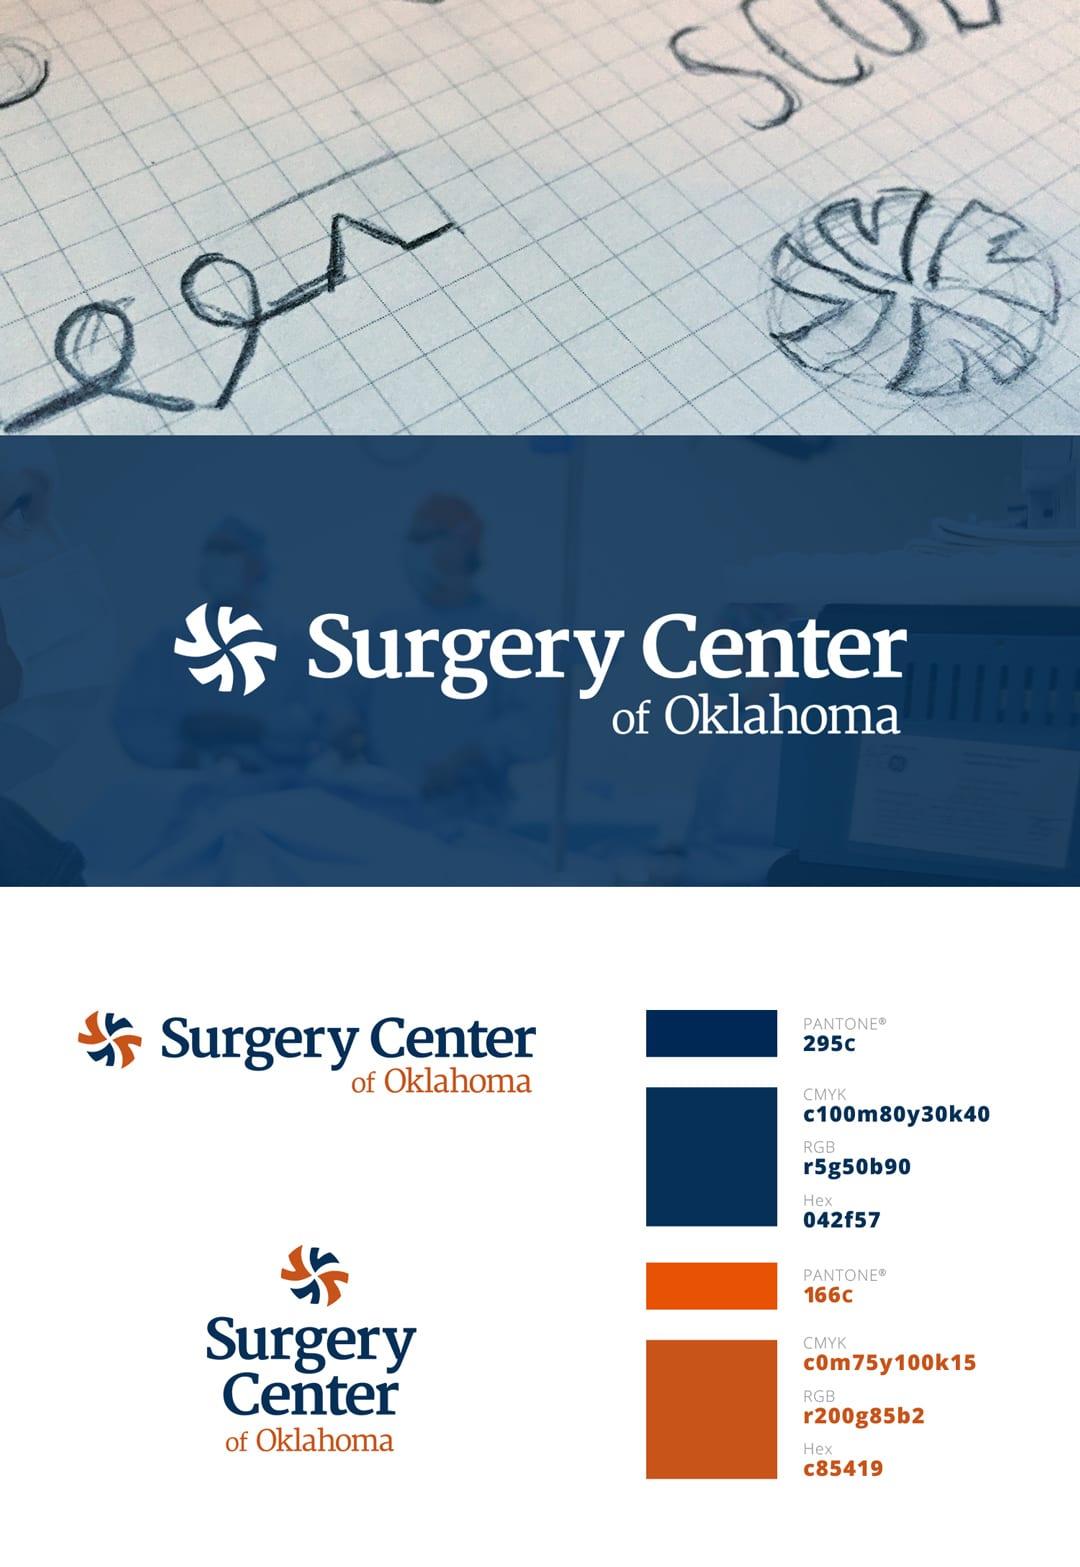 Surgery Center of Oklahoma Logo Design by Liquid Media